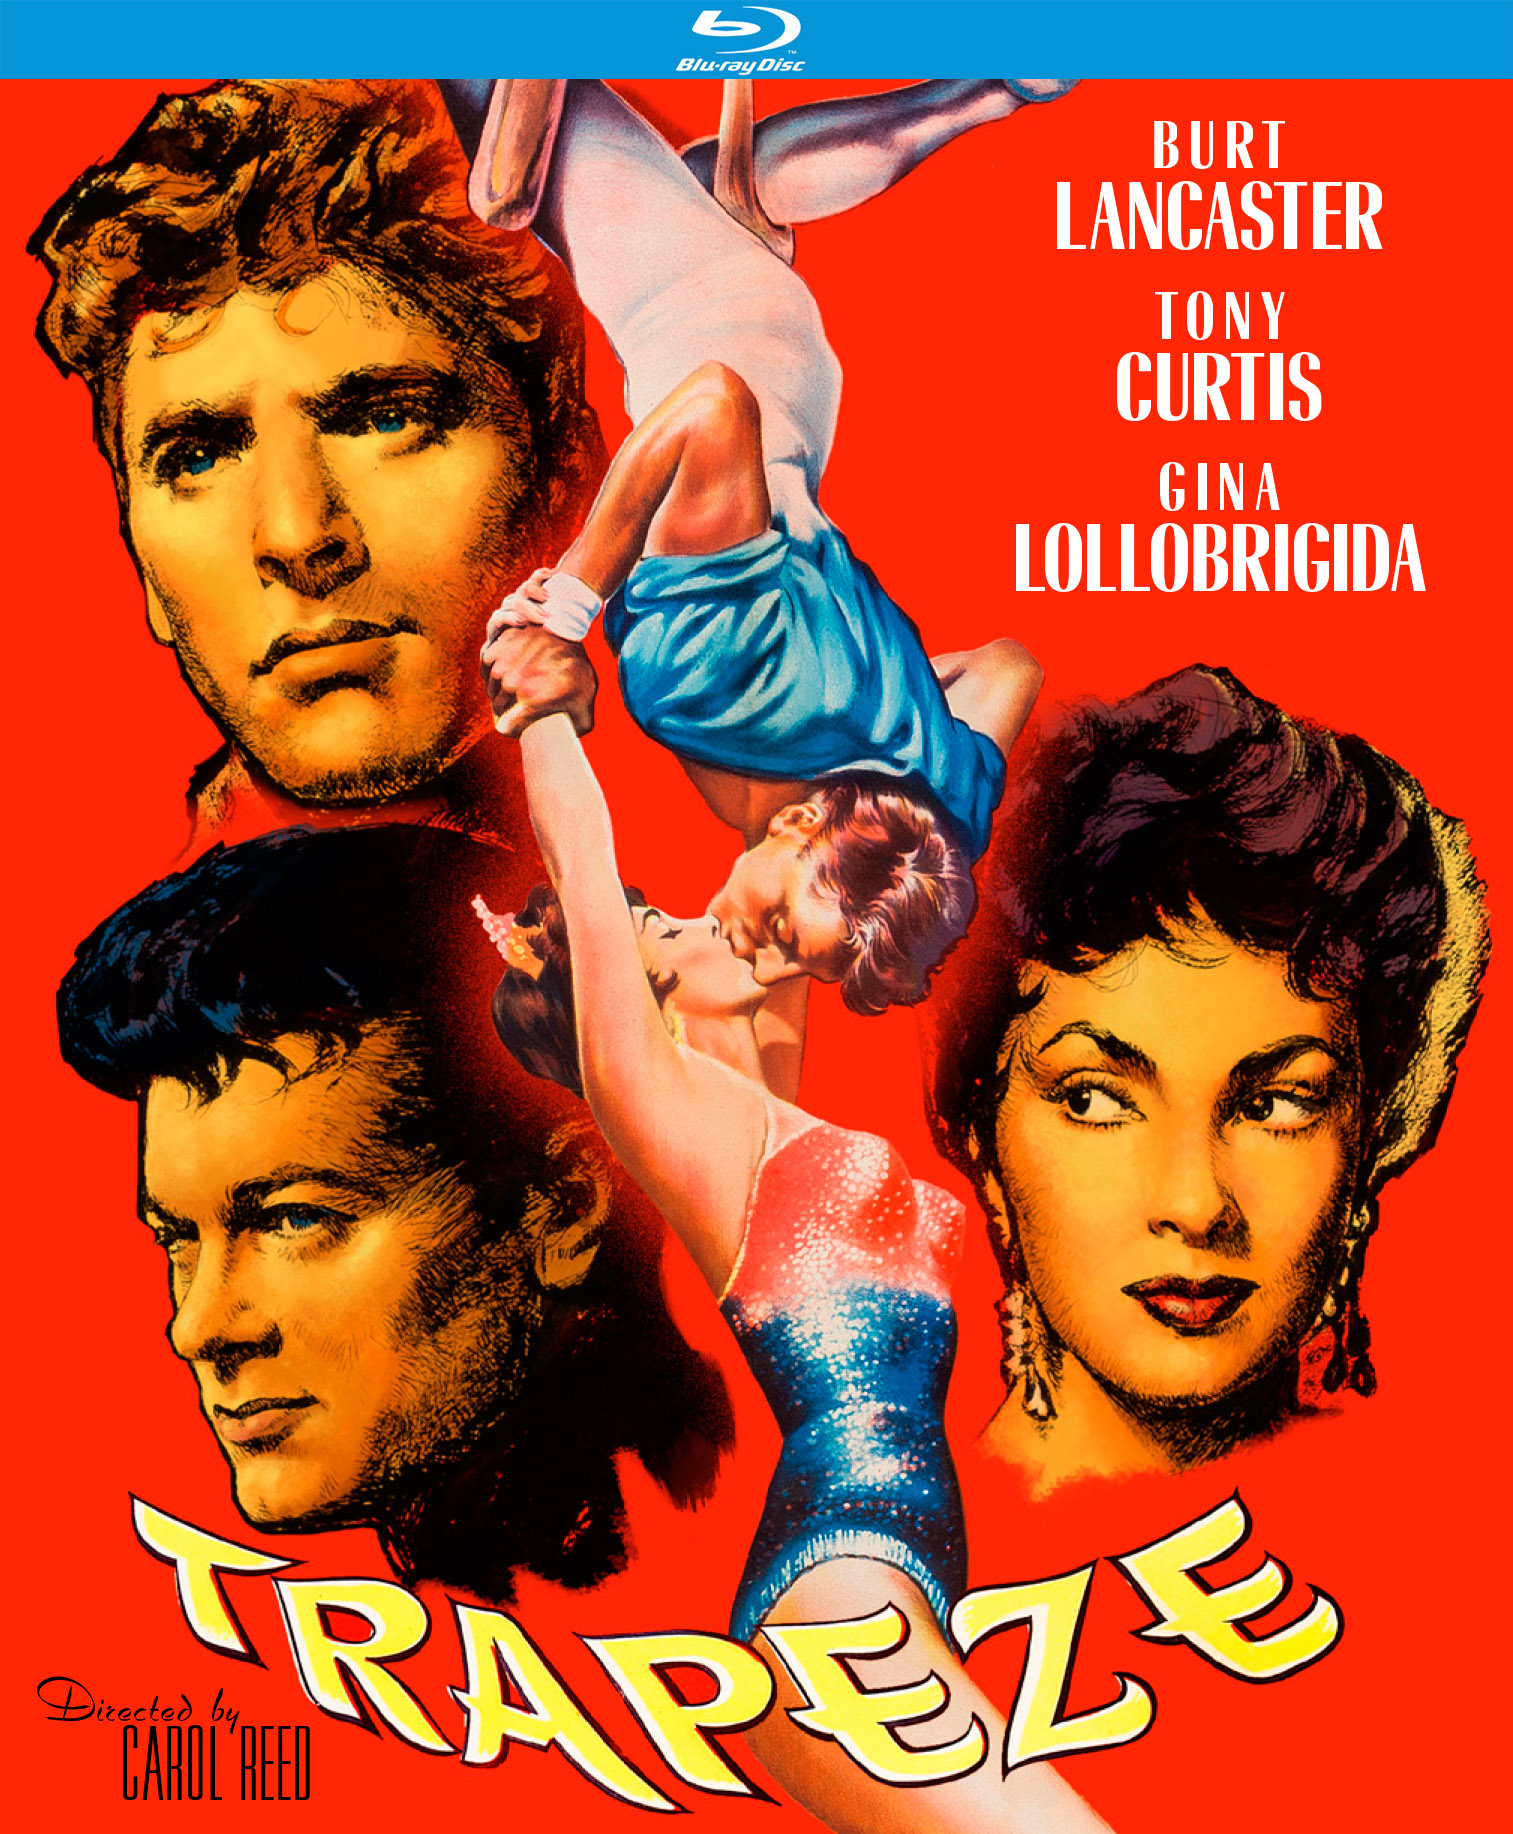 Trapeze Blu Ray Kino Lorber Home Video